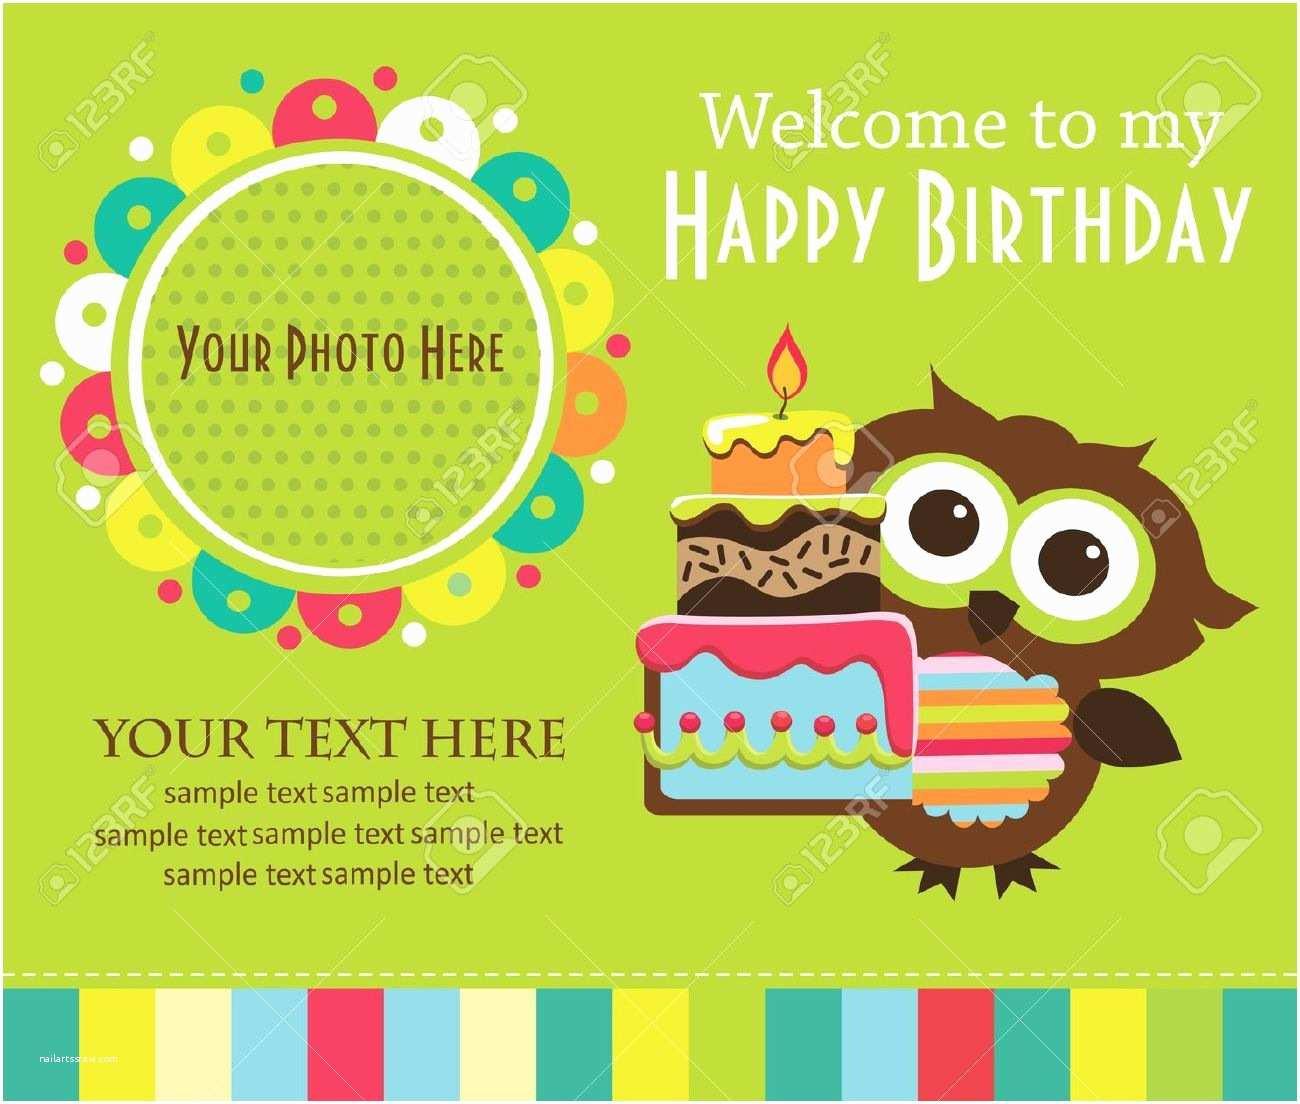 Happy Birthday Invitation Birthday Invitation Card Template for Kids